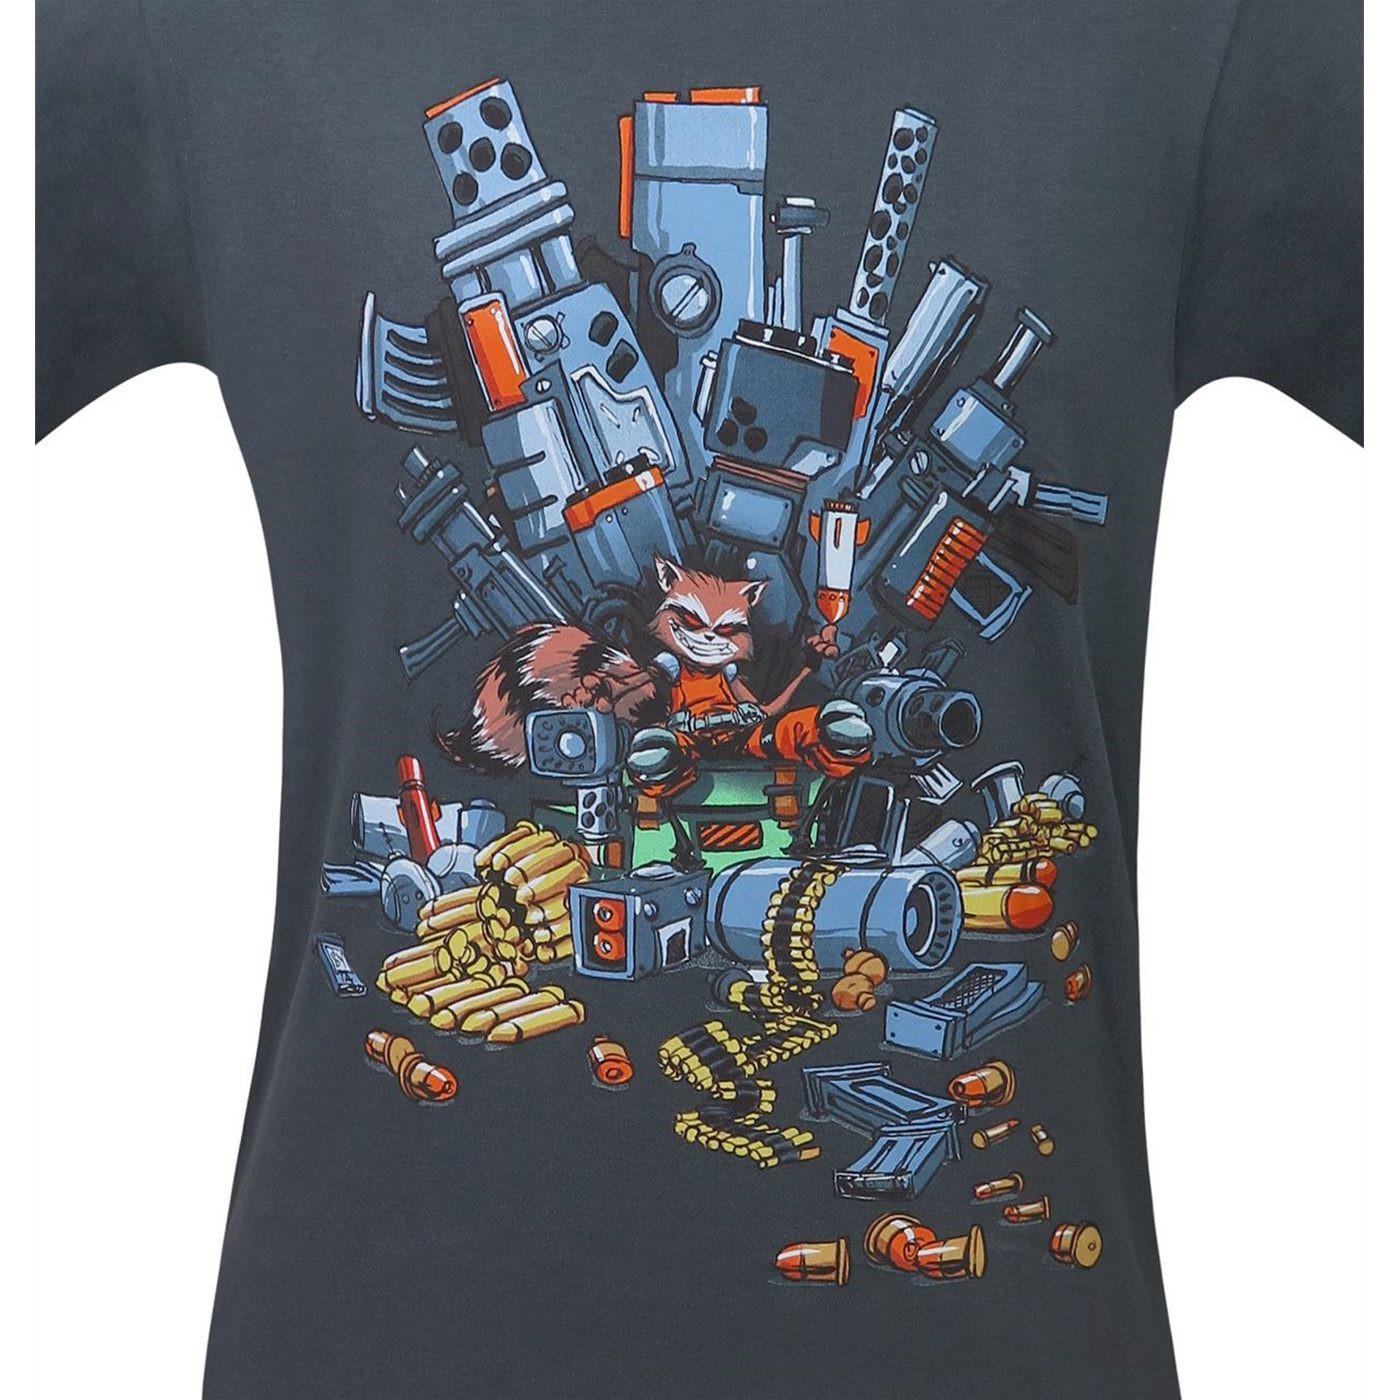 GOTG Rocket Raccoon Fully Loaded Bio T-Shirt